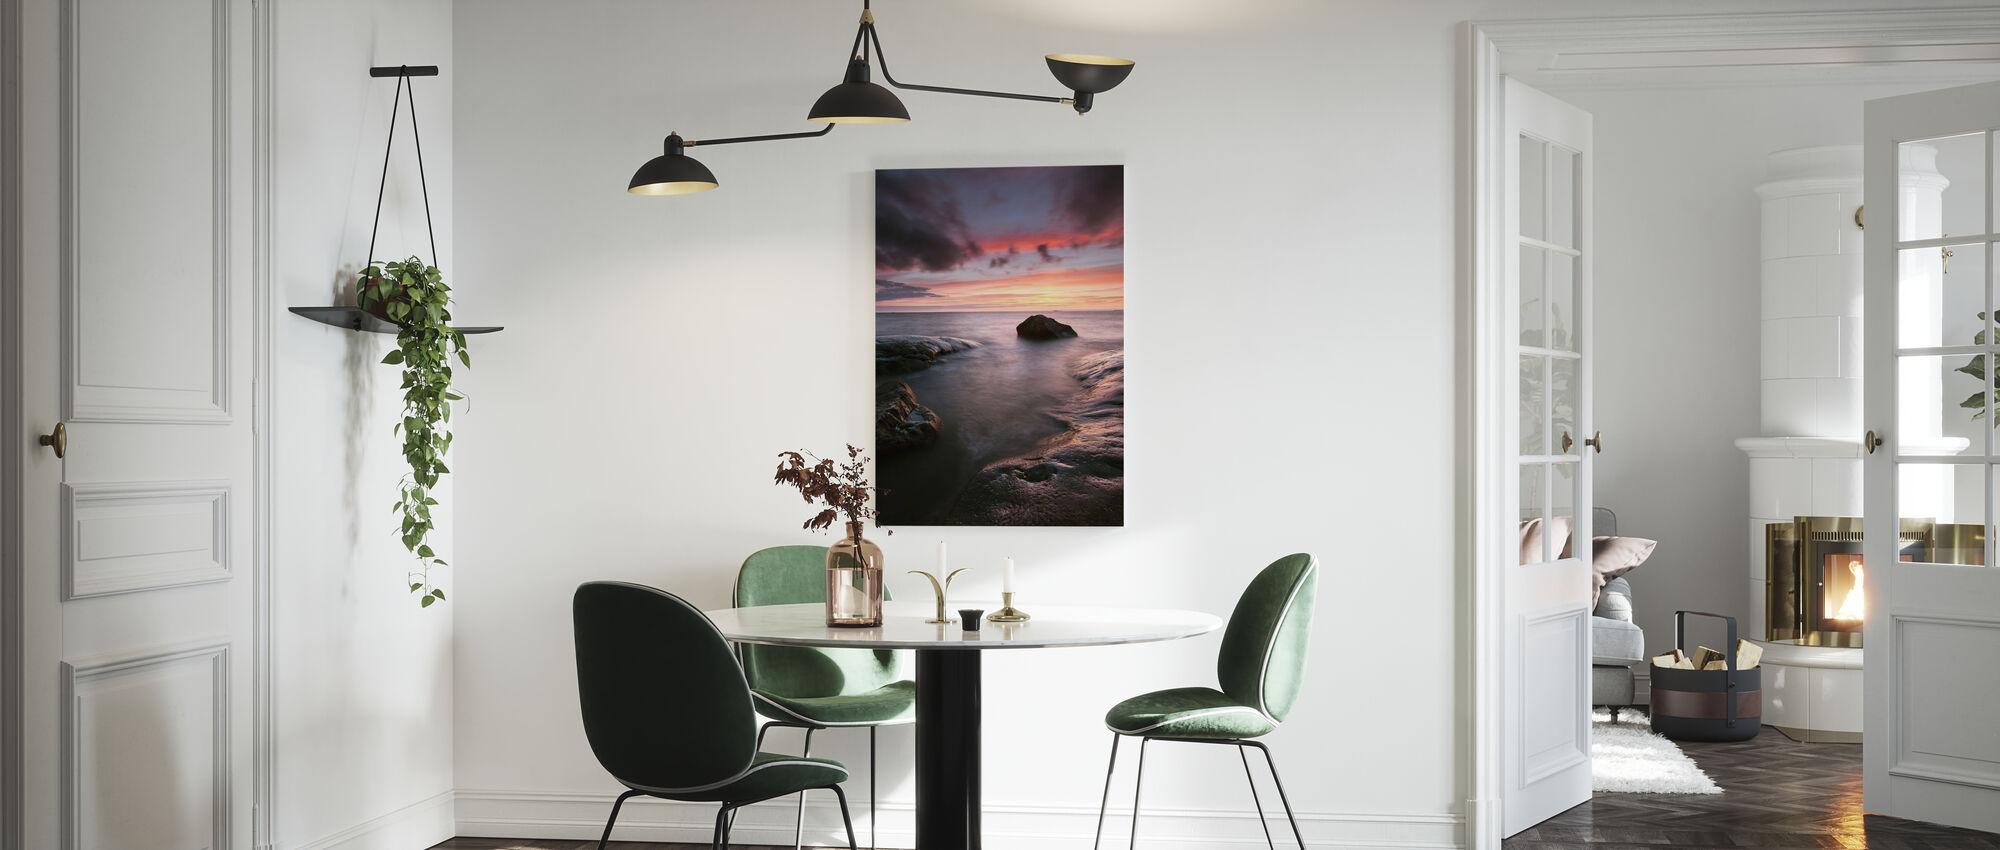 Sunset, Hönö - Sweden - Canvastavla - Kök